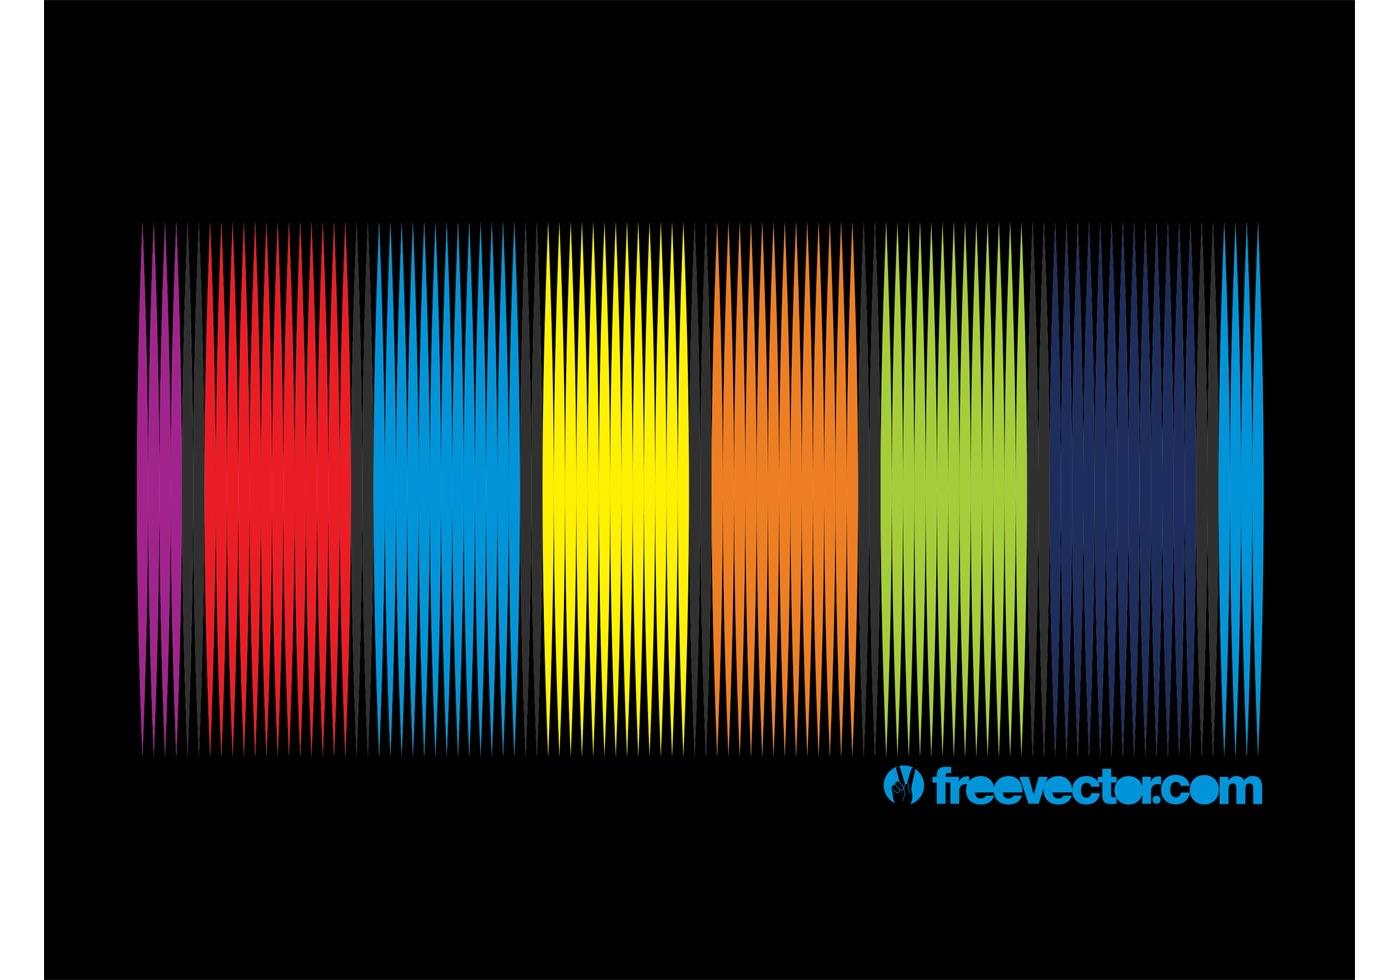 rainbow vector background design download free vector